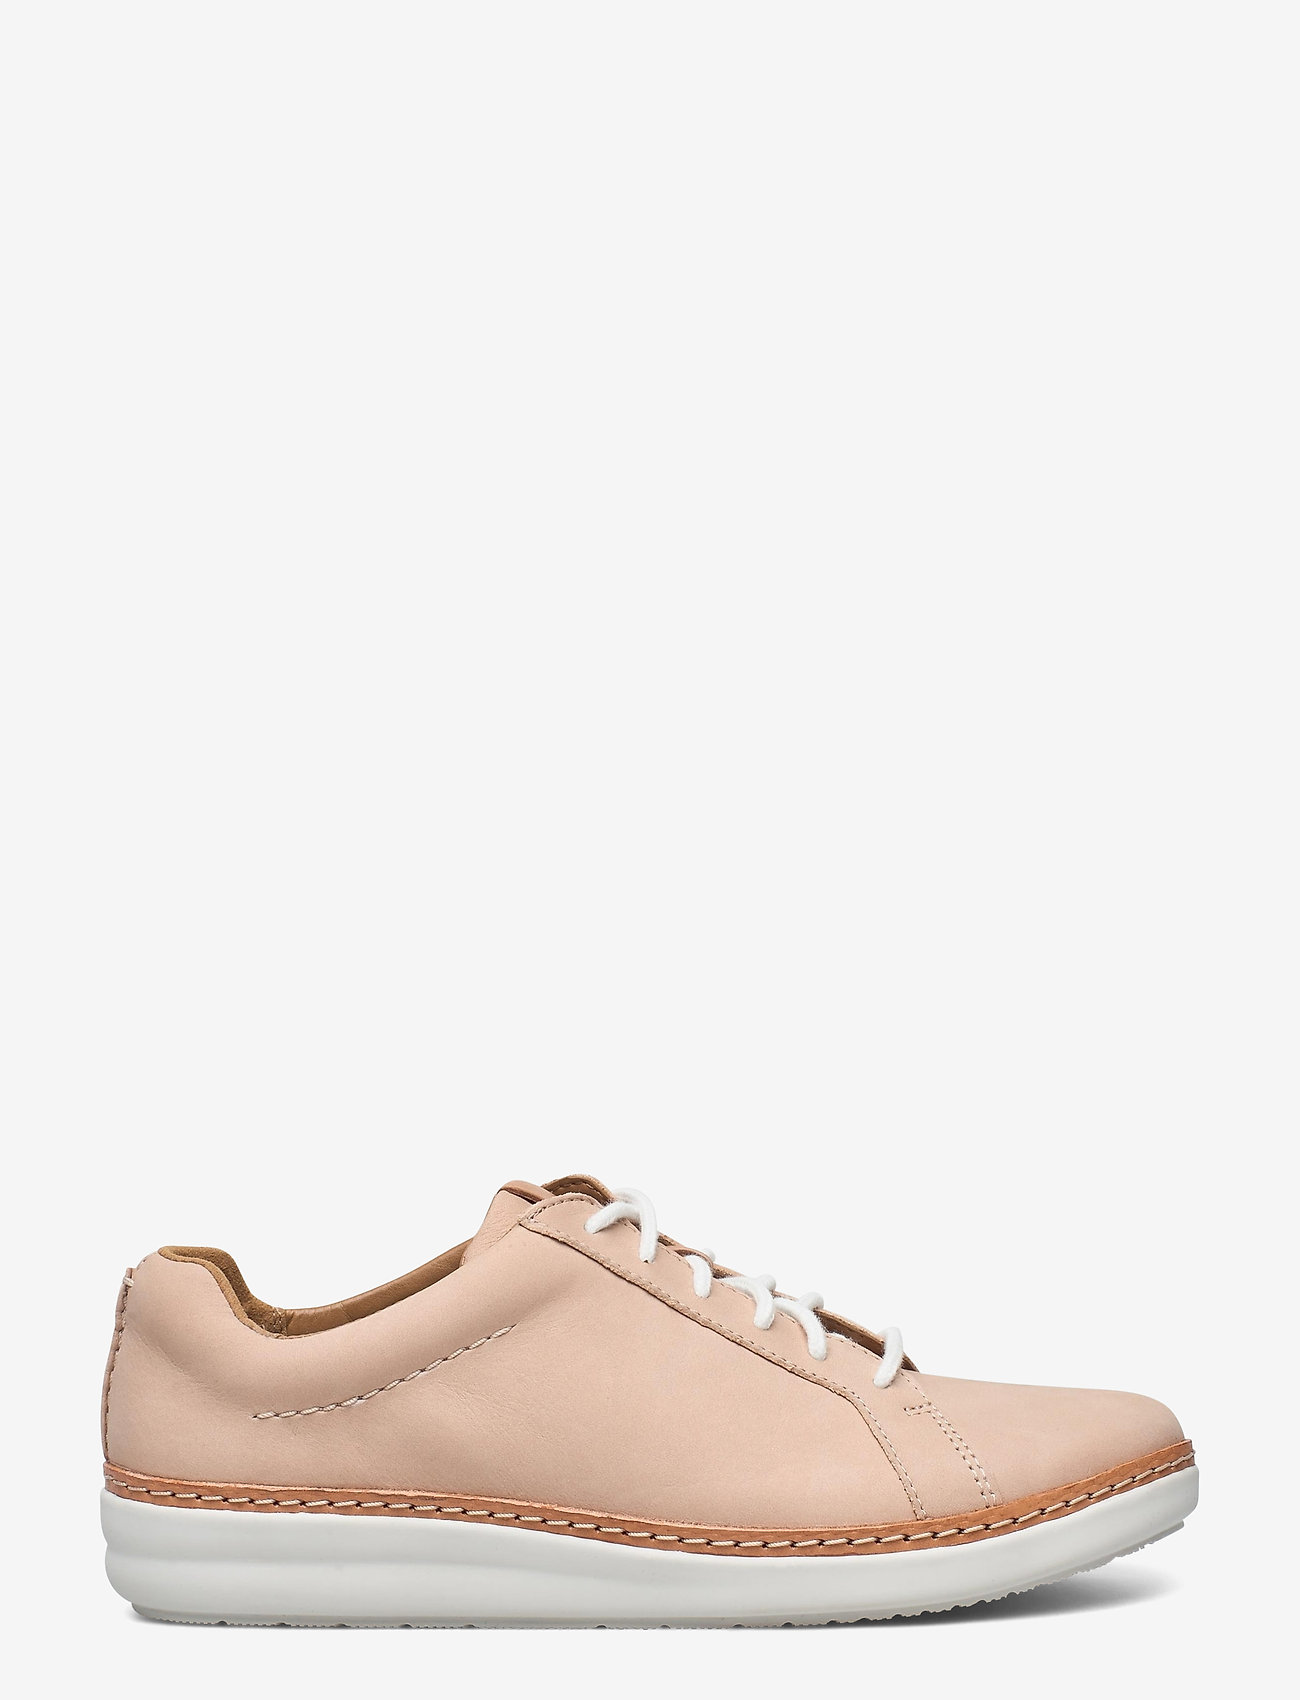 Clarks - Amberlee Rosa - låga sneakers - nude nubuck - 1